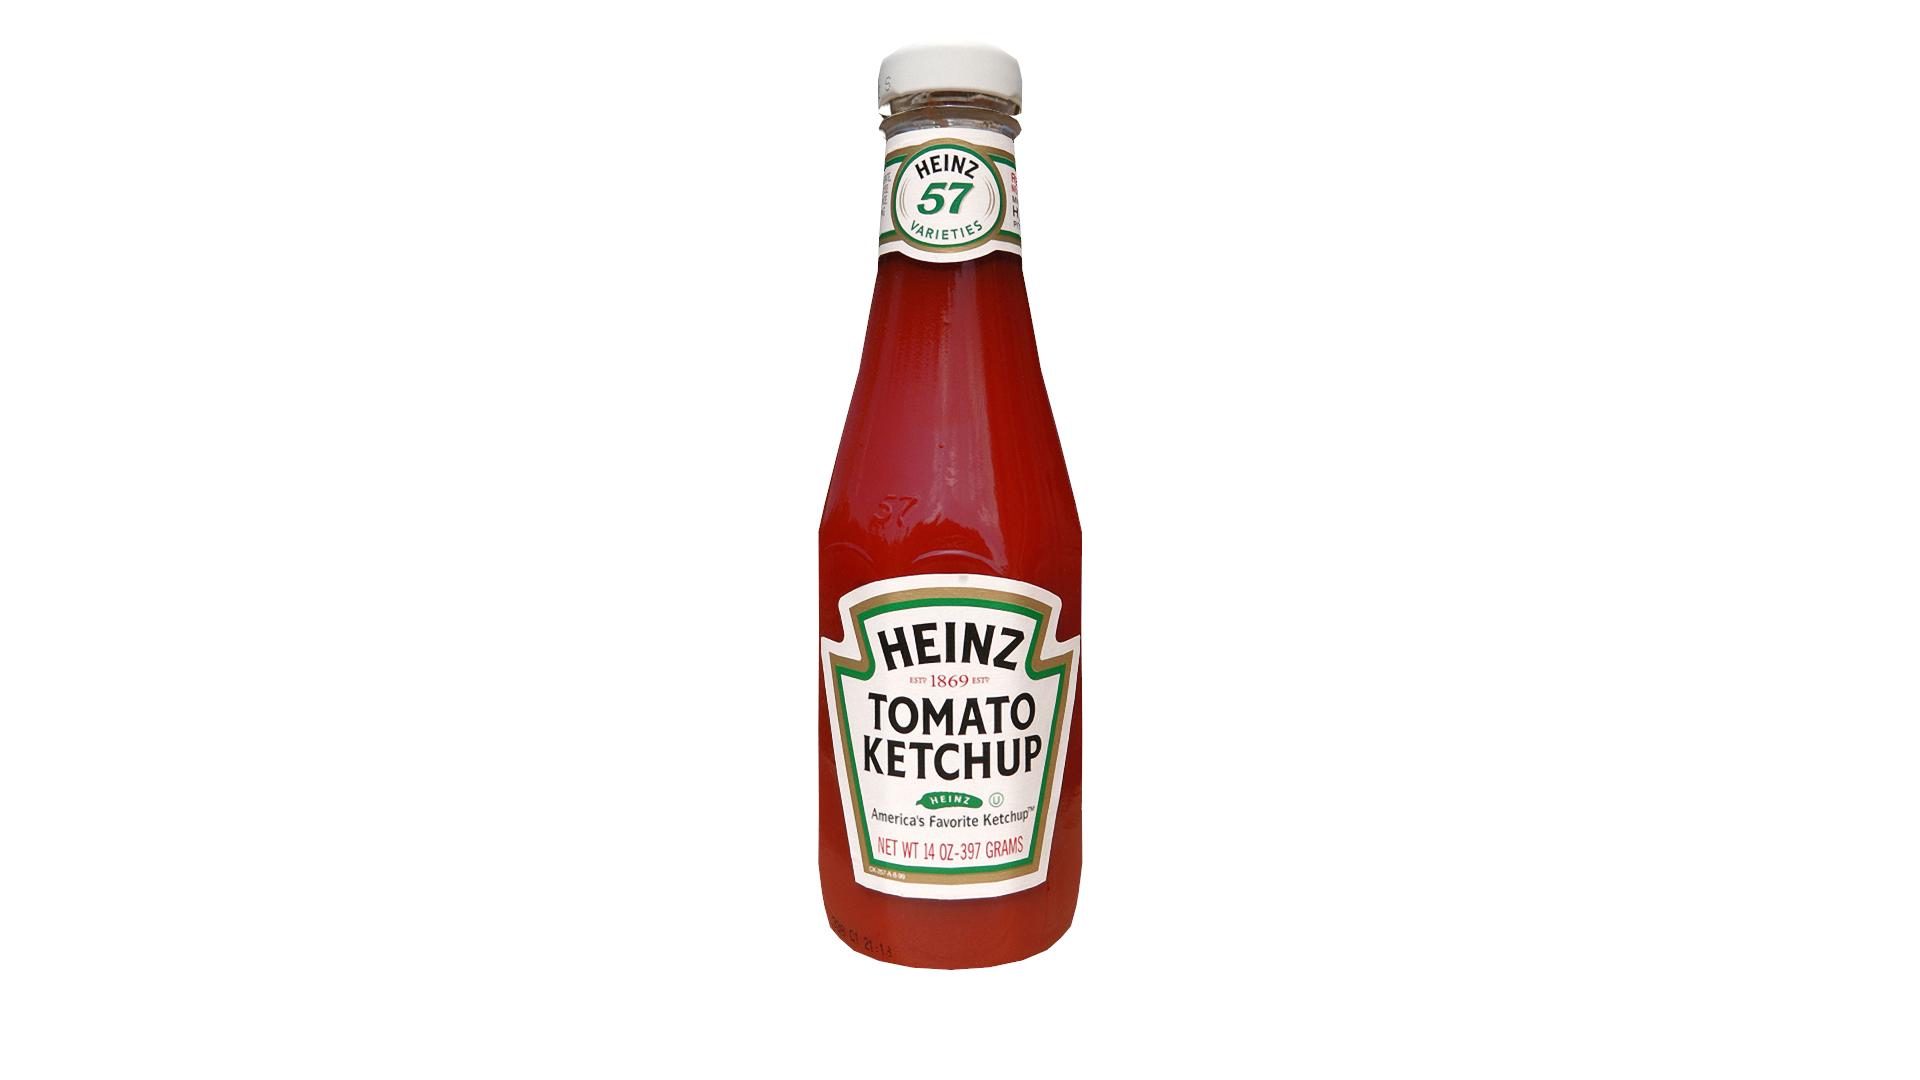 Clipart transparent background free. Ketchup bottle png